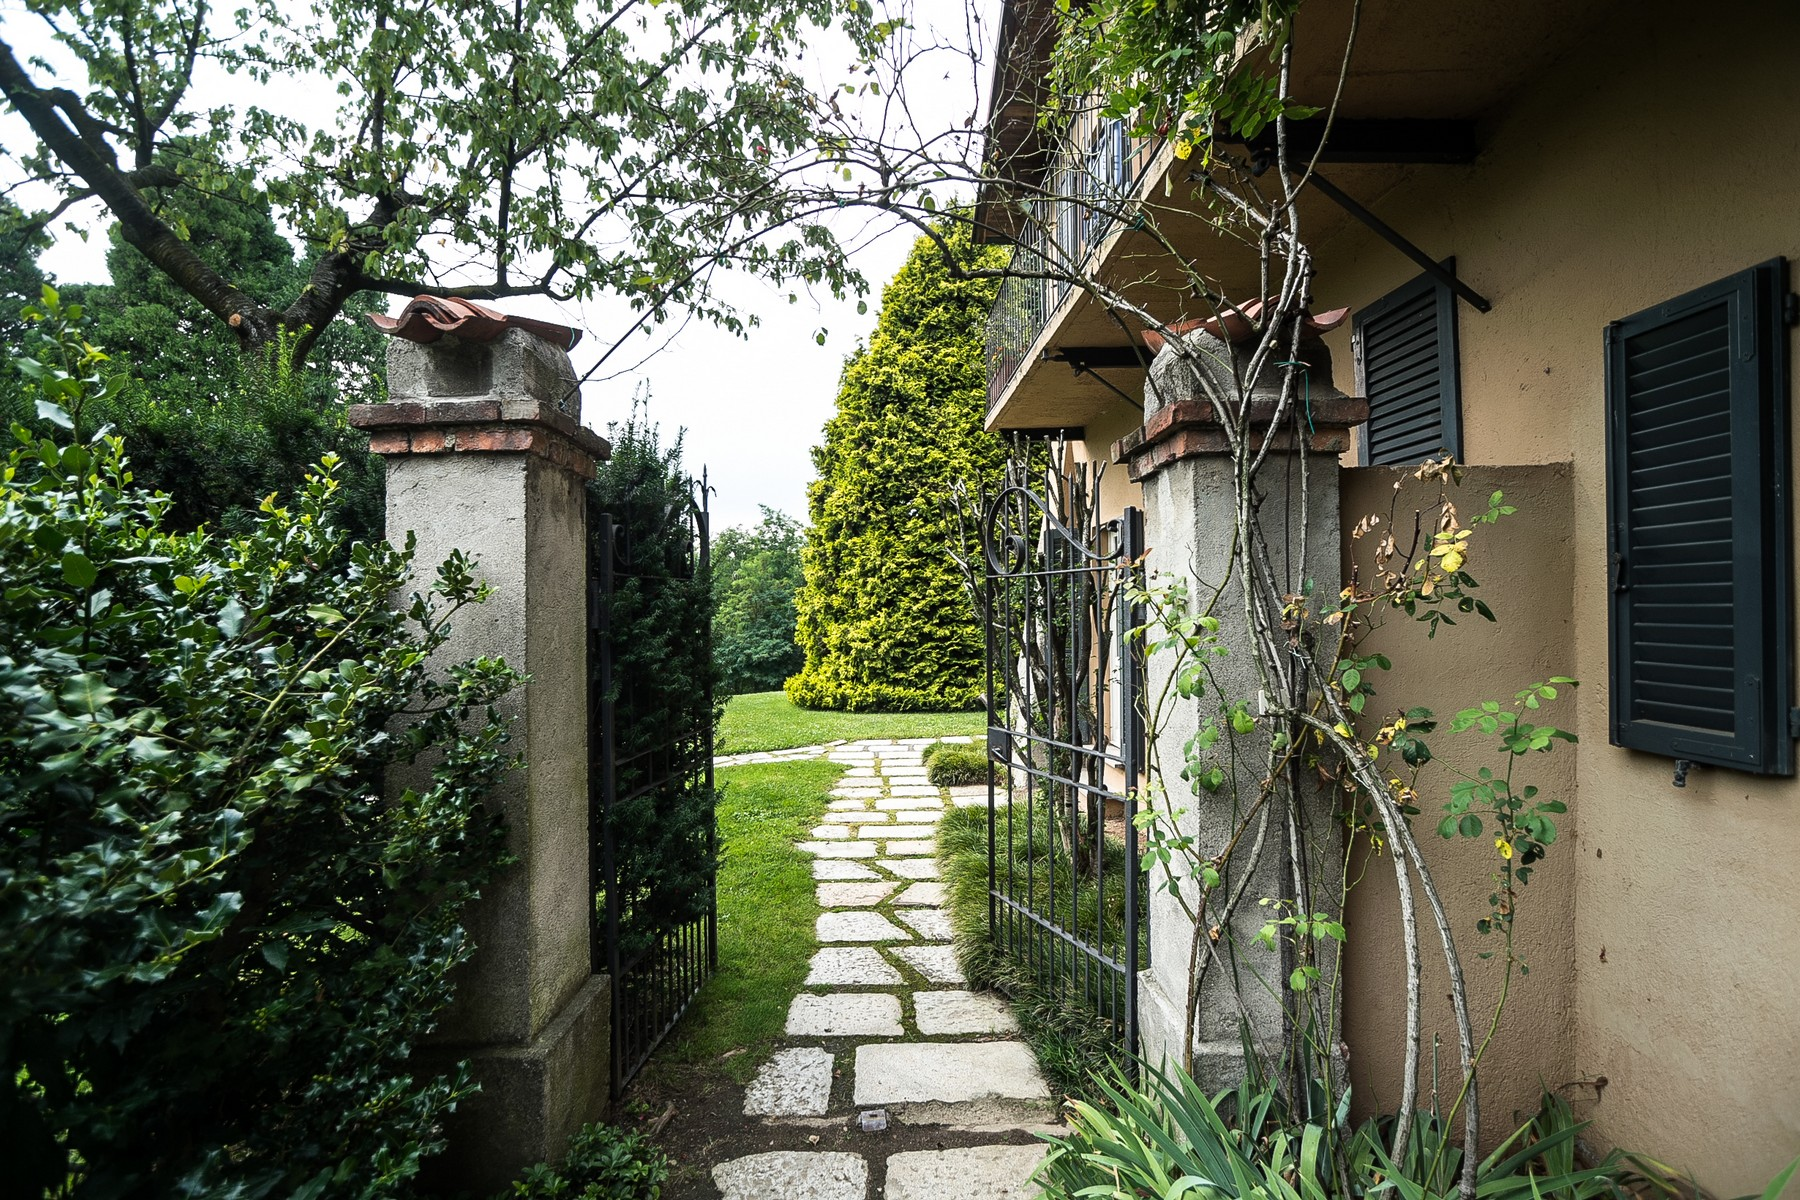 Villa in Vendita a Carimate: 5 locali, 800 mq - Foto 2